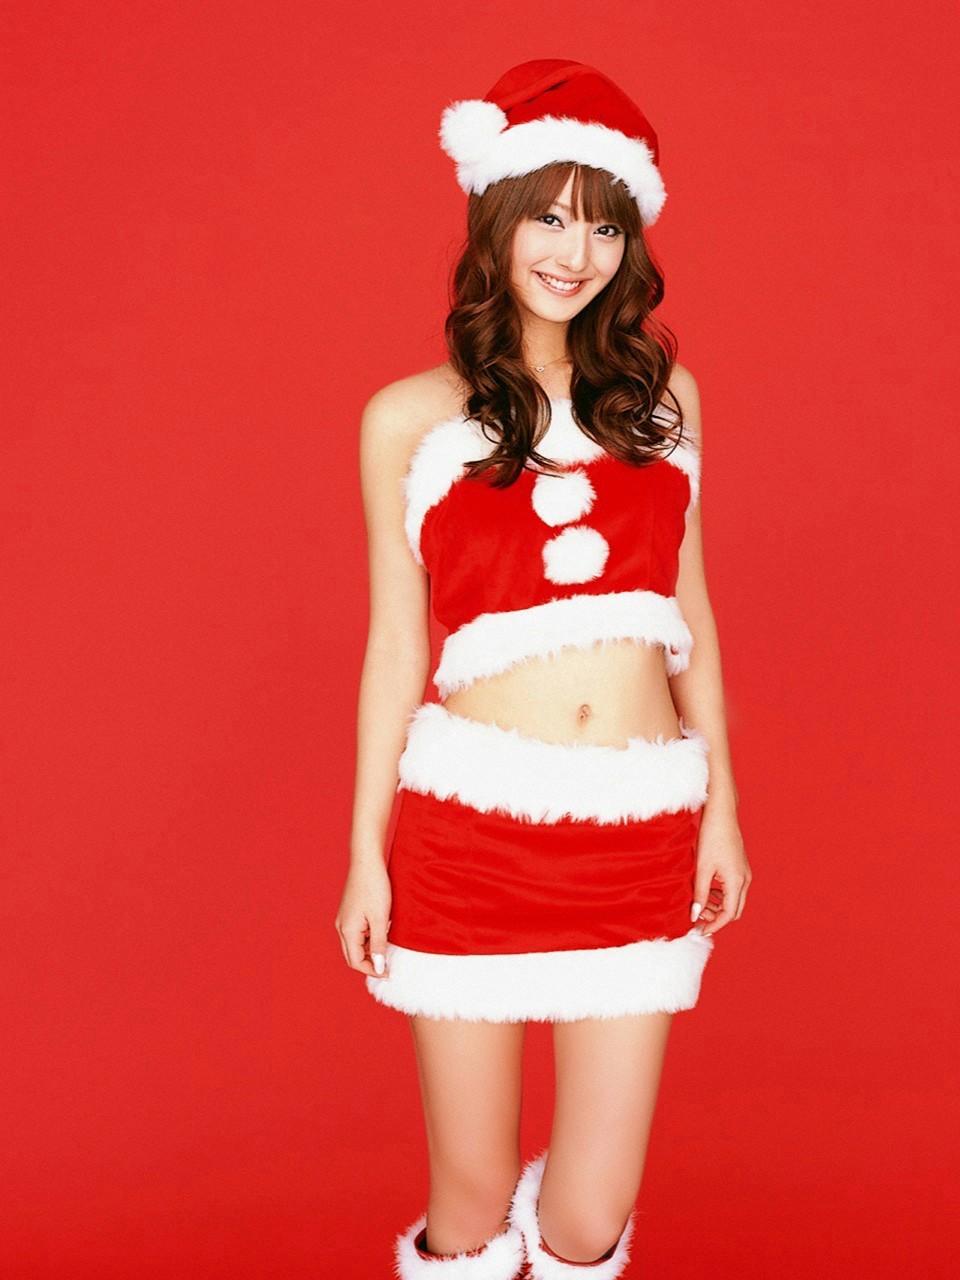 http://blog.cnobi.jp/v1/blog/user/a8c5c06266ed65ea9b67299e90592fa7/1291469326